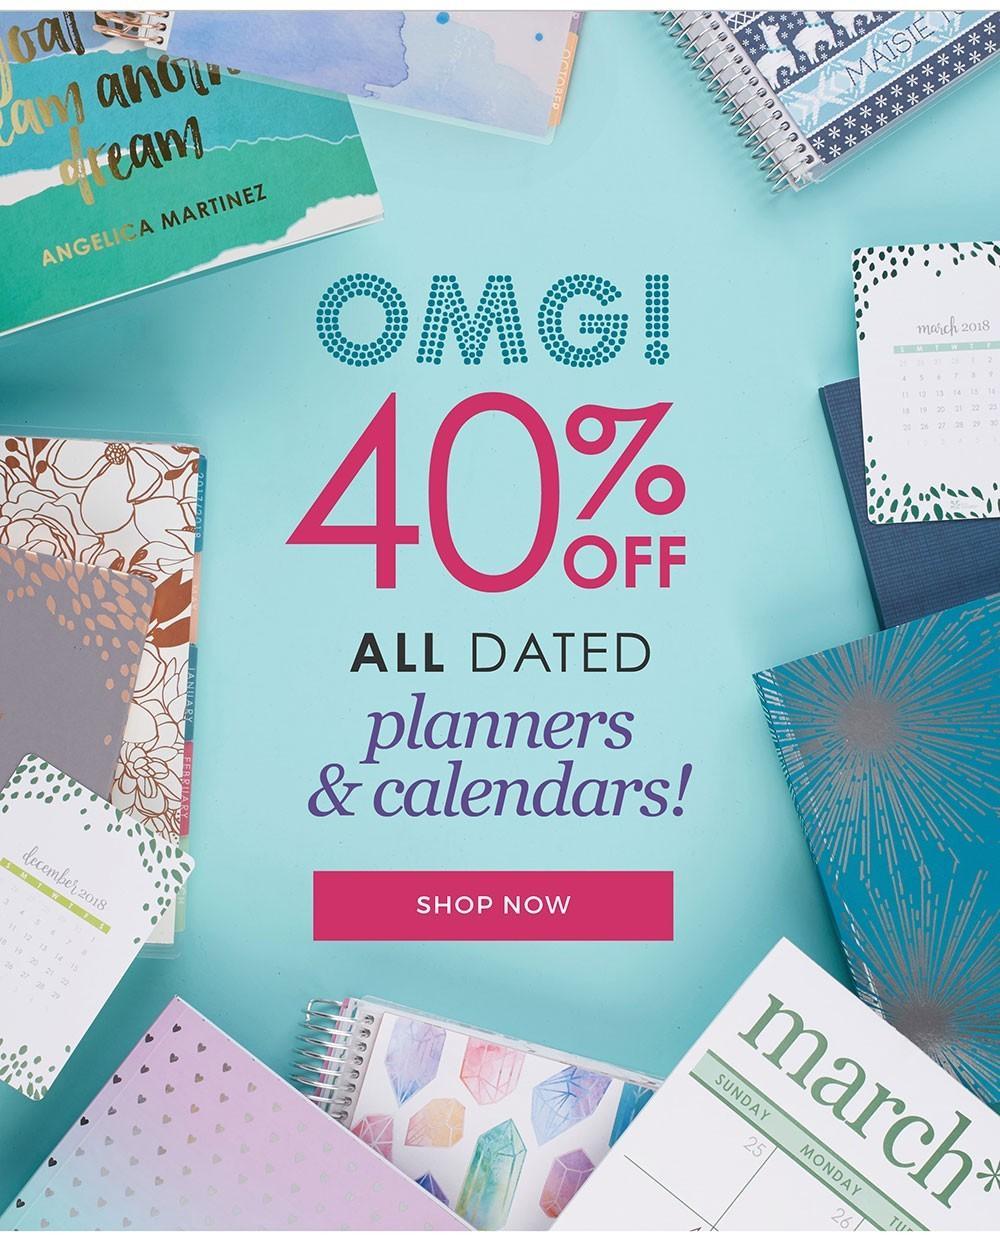 Erin Condren Sale – Save 40% Off Life Planners!